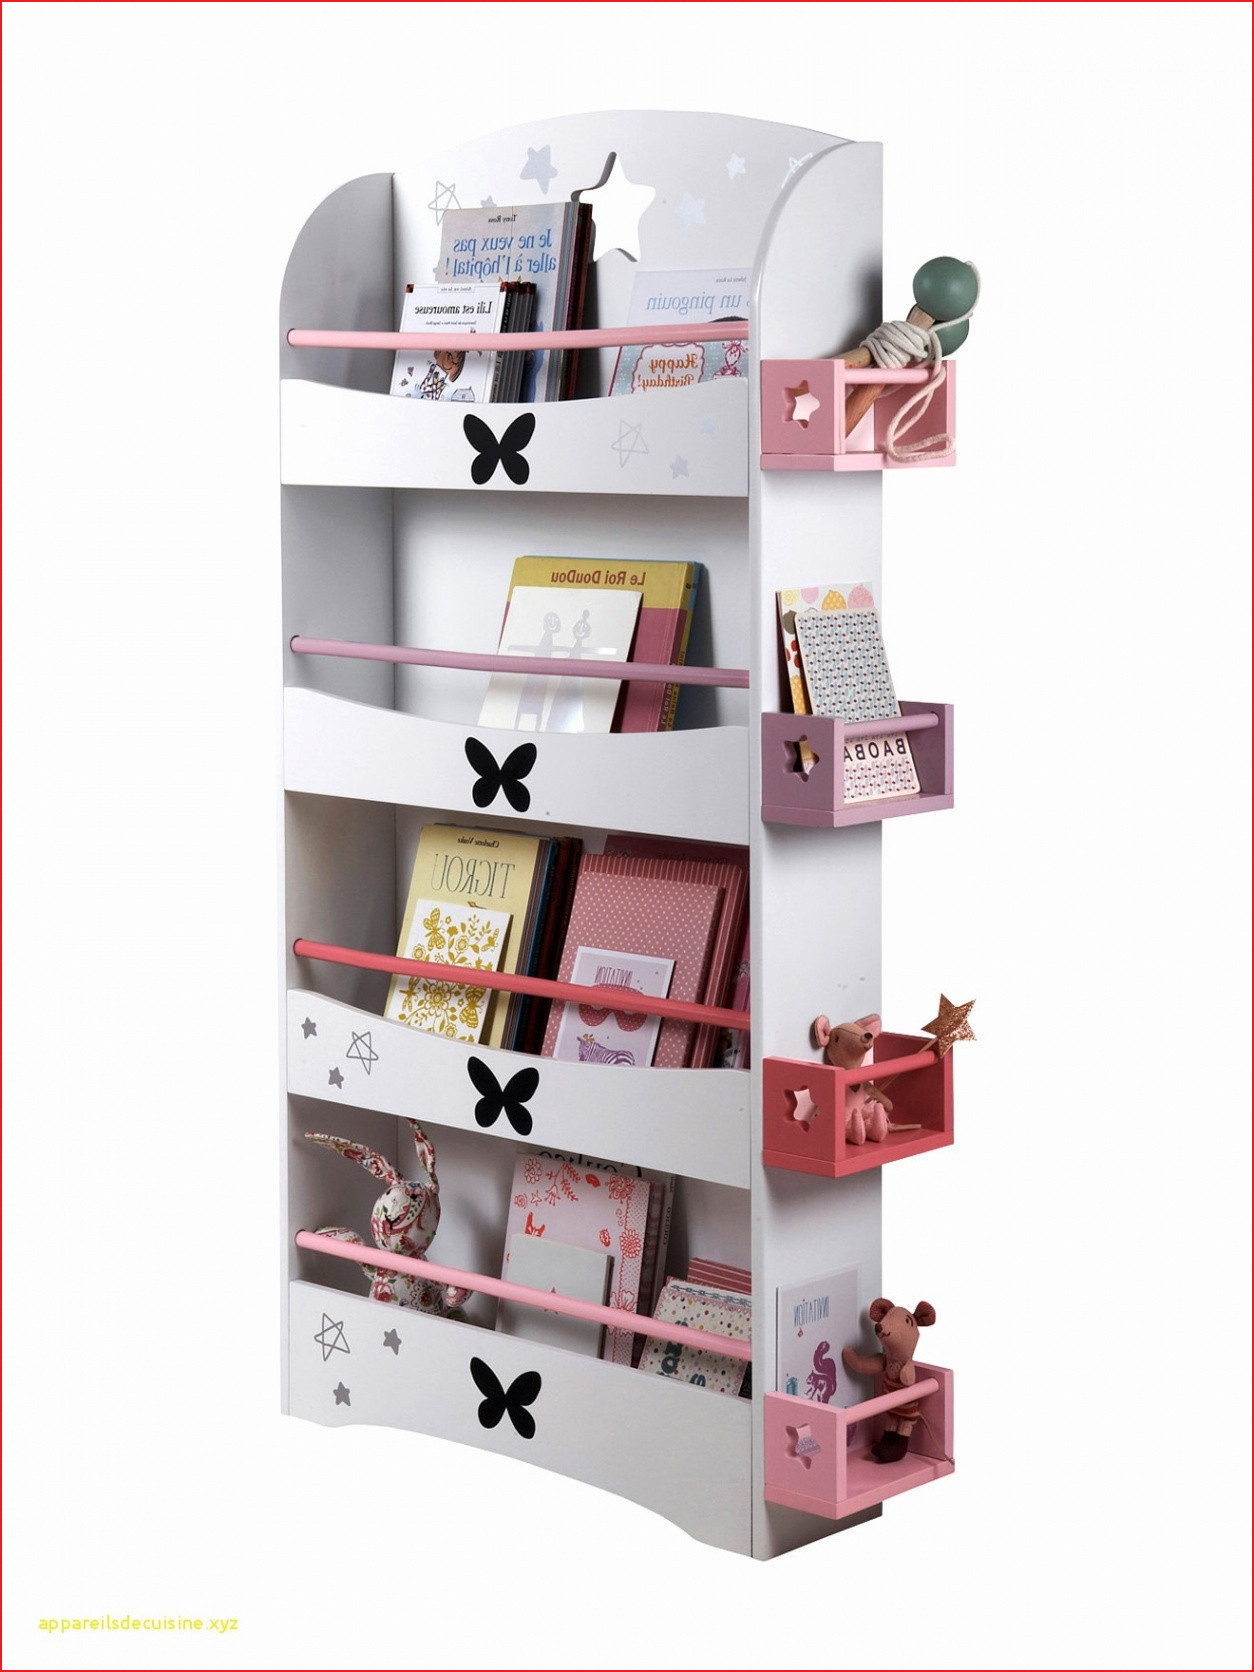 armoire de rangement en resine castorama meuble rangement 71 meuble a papier of armoire de rangement en resine